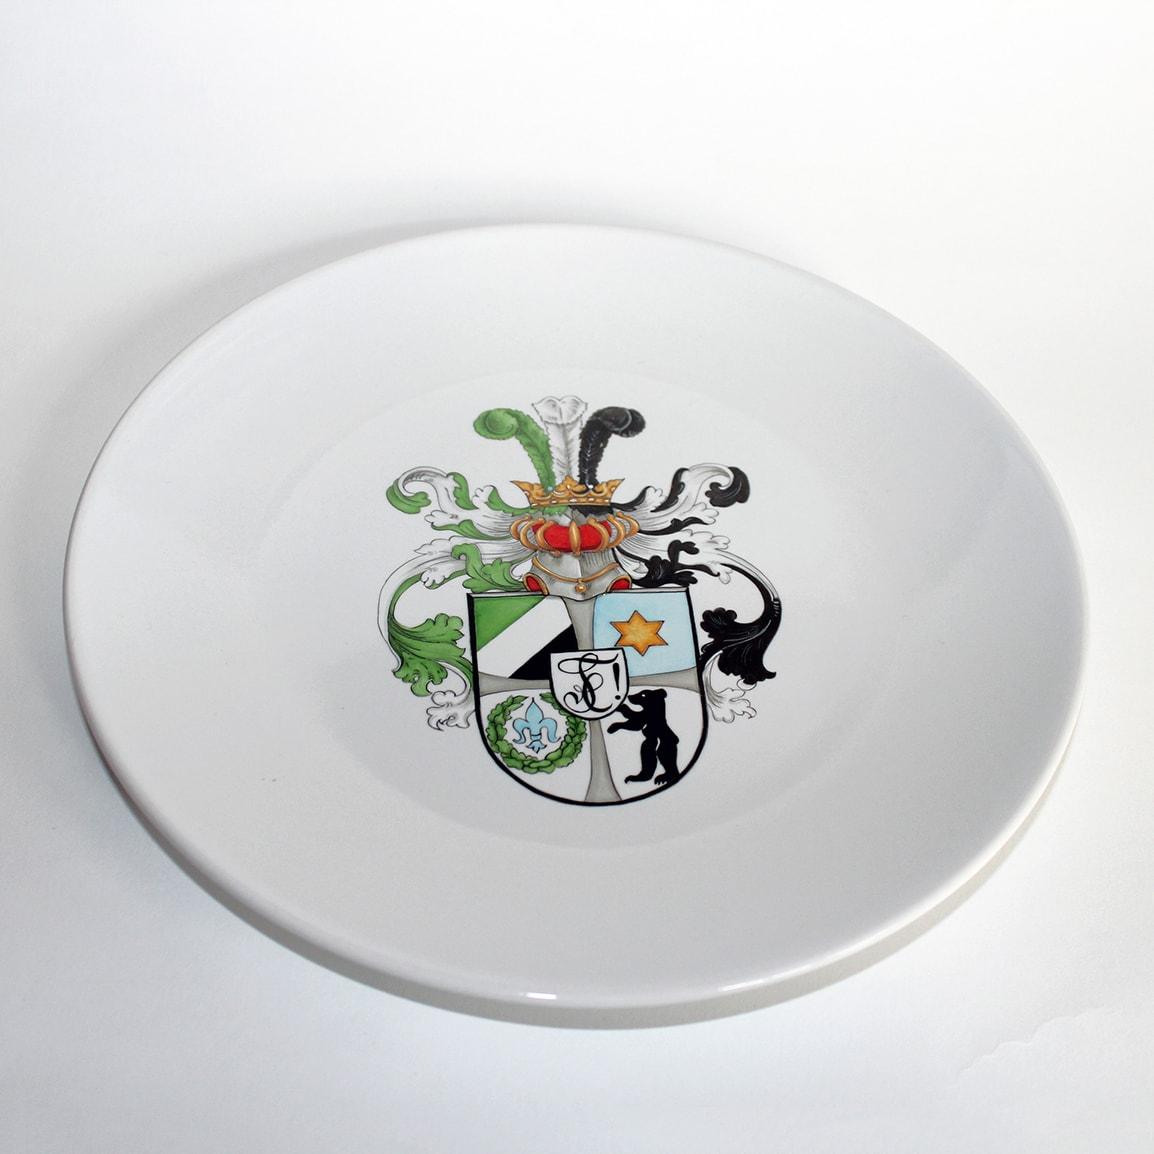 Porzellanteller mit handbemaltem Wappen